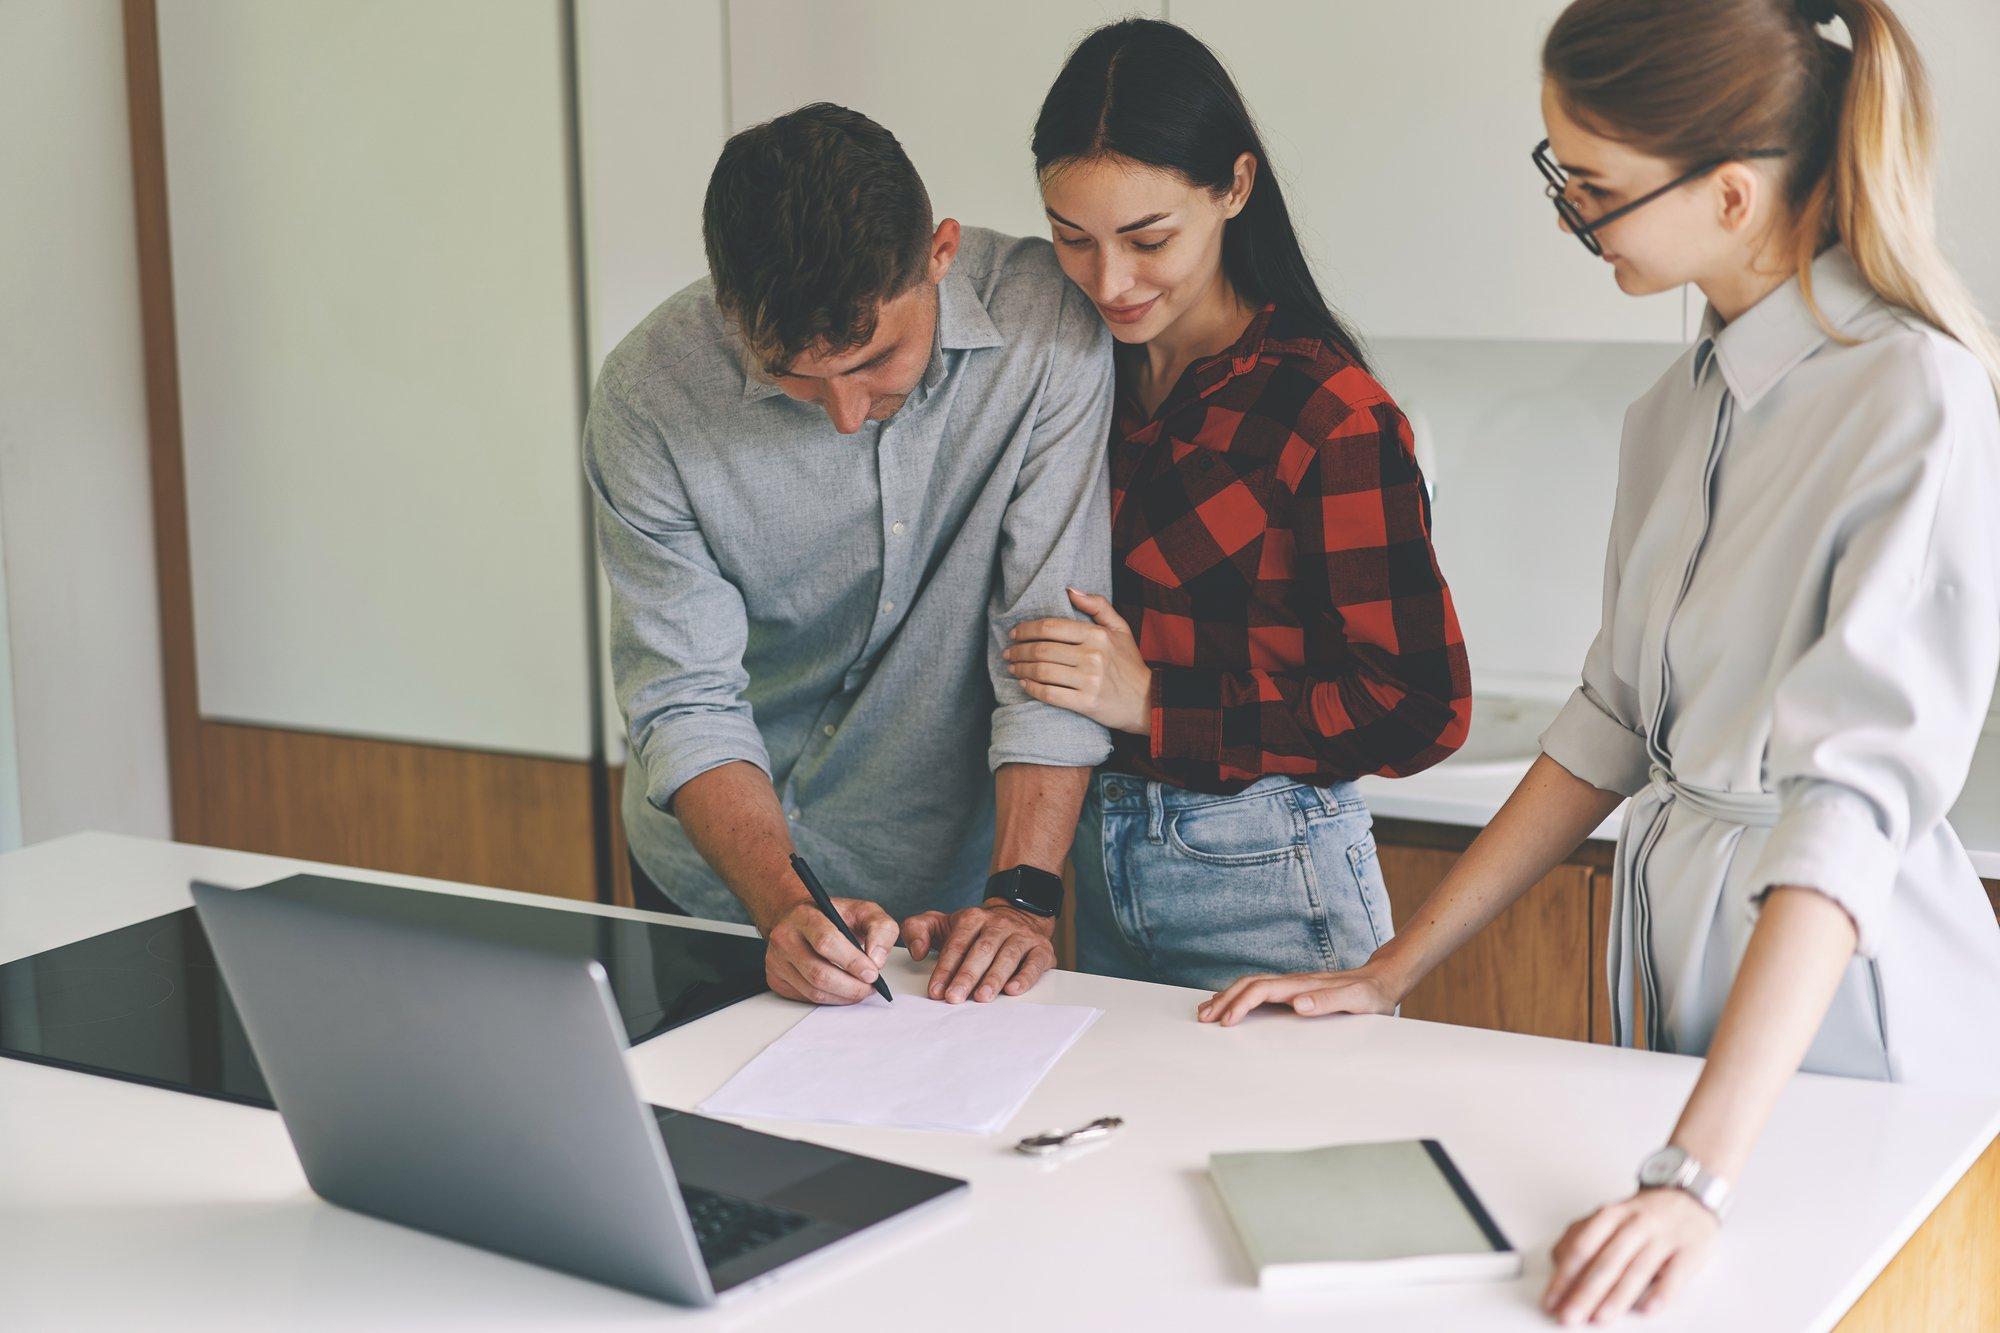 Successful business woman realtor advises clients